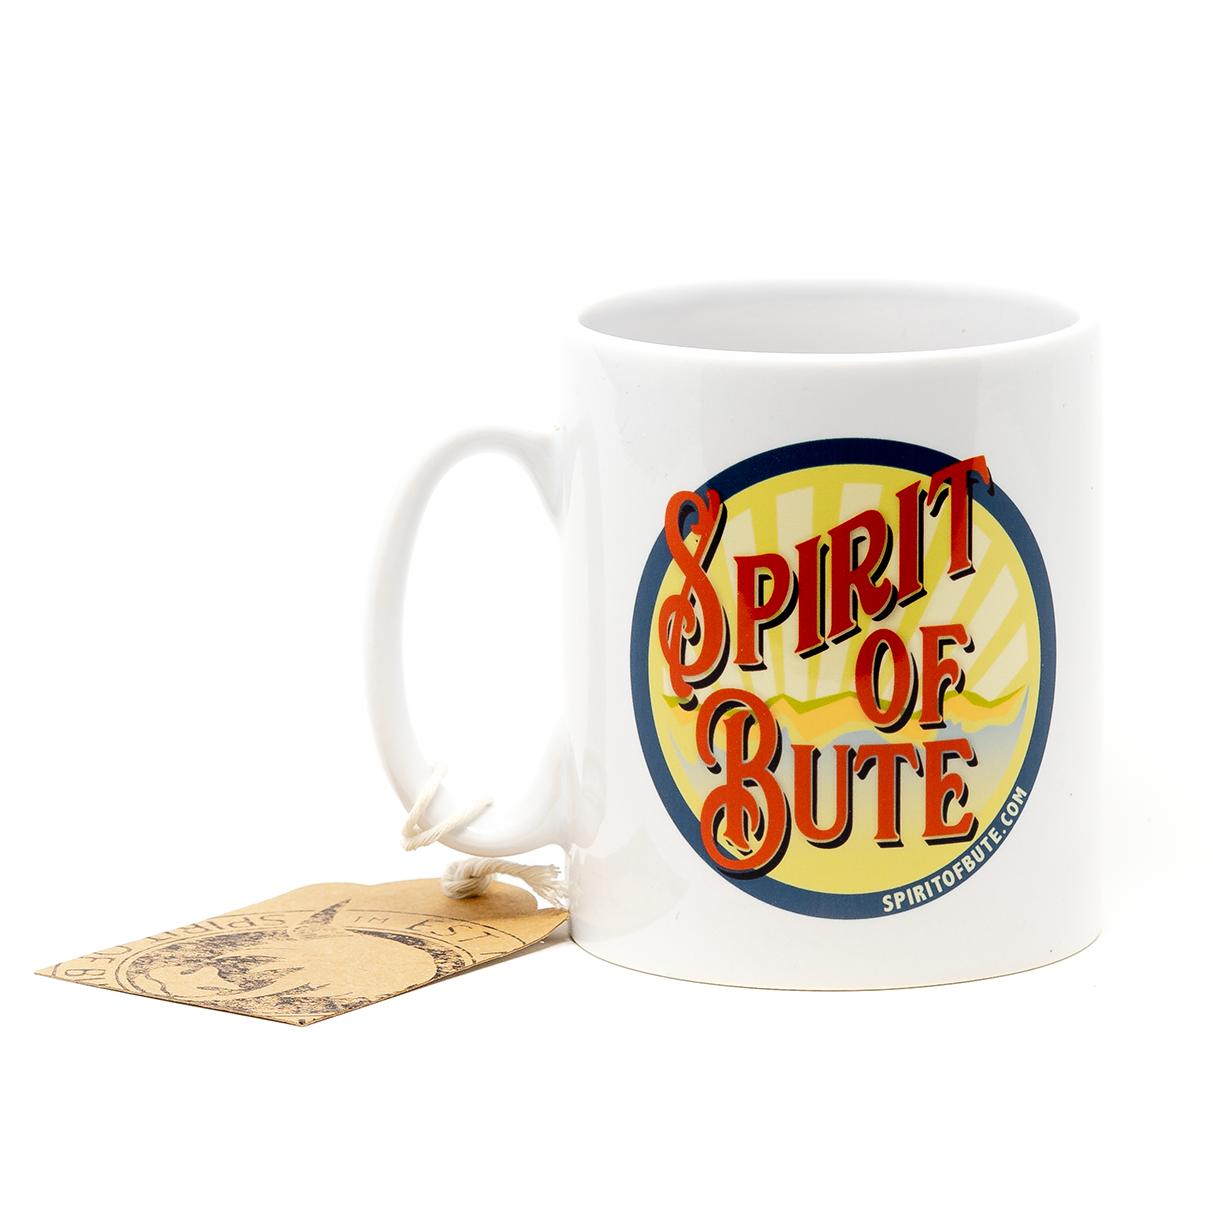 1930s SOB Mug